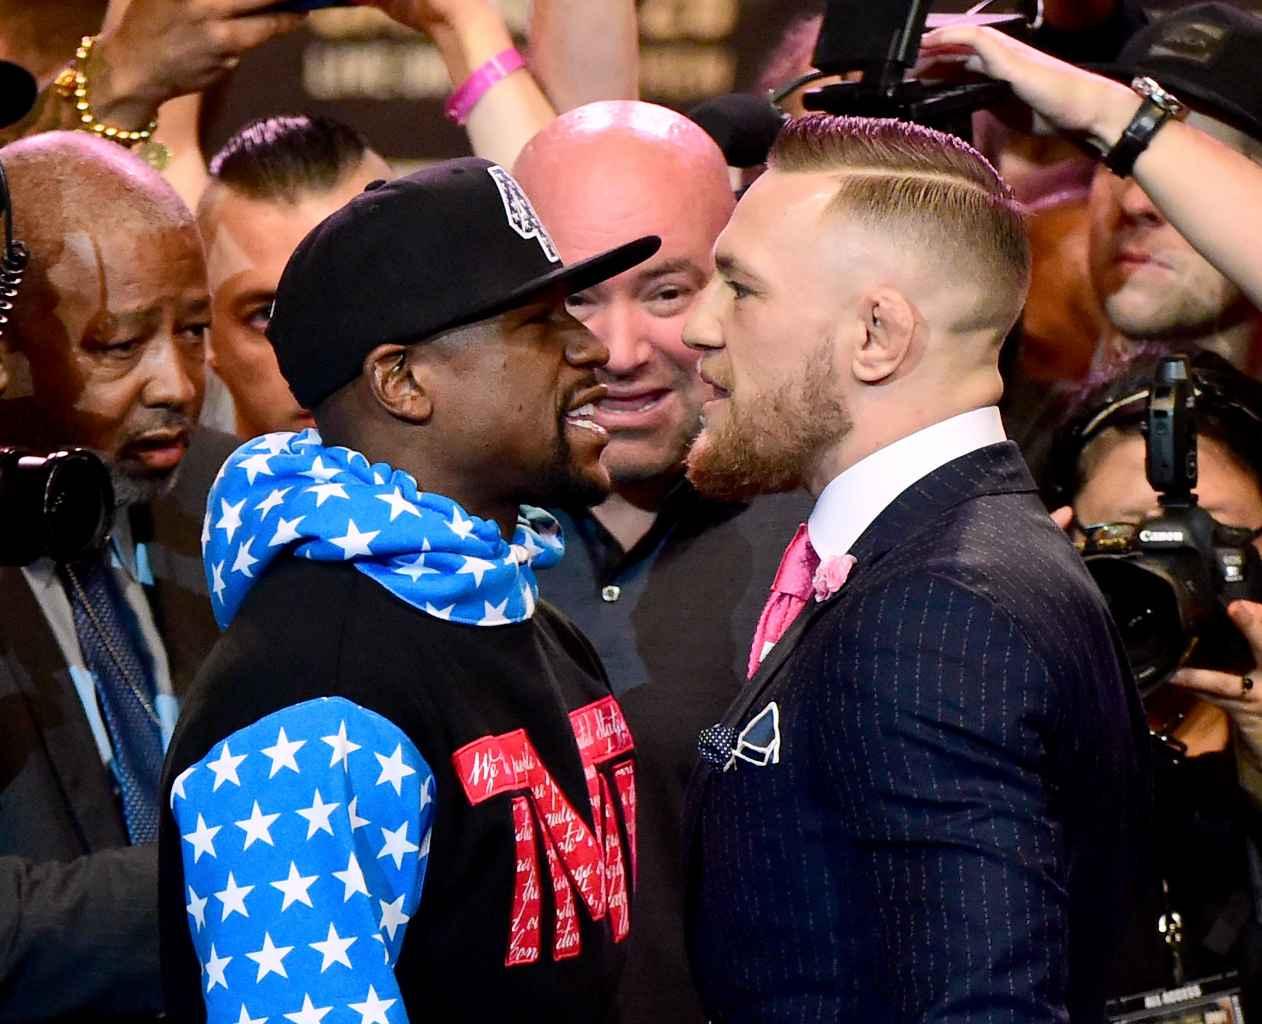 Boxeo-Mayweather-McGregor-Versión-Final.jpg